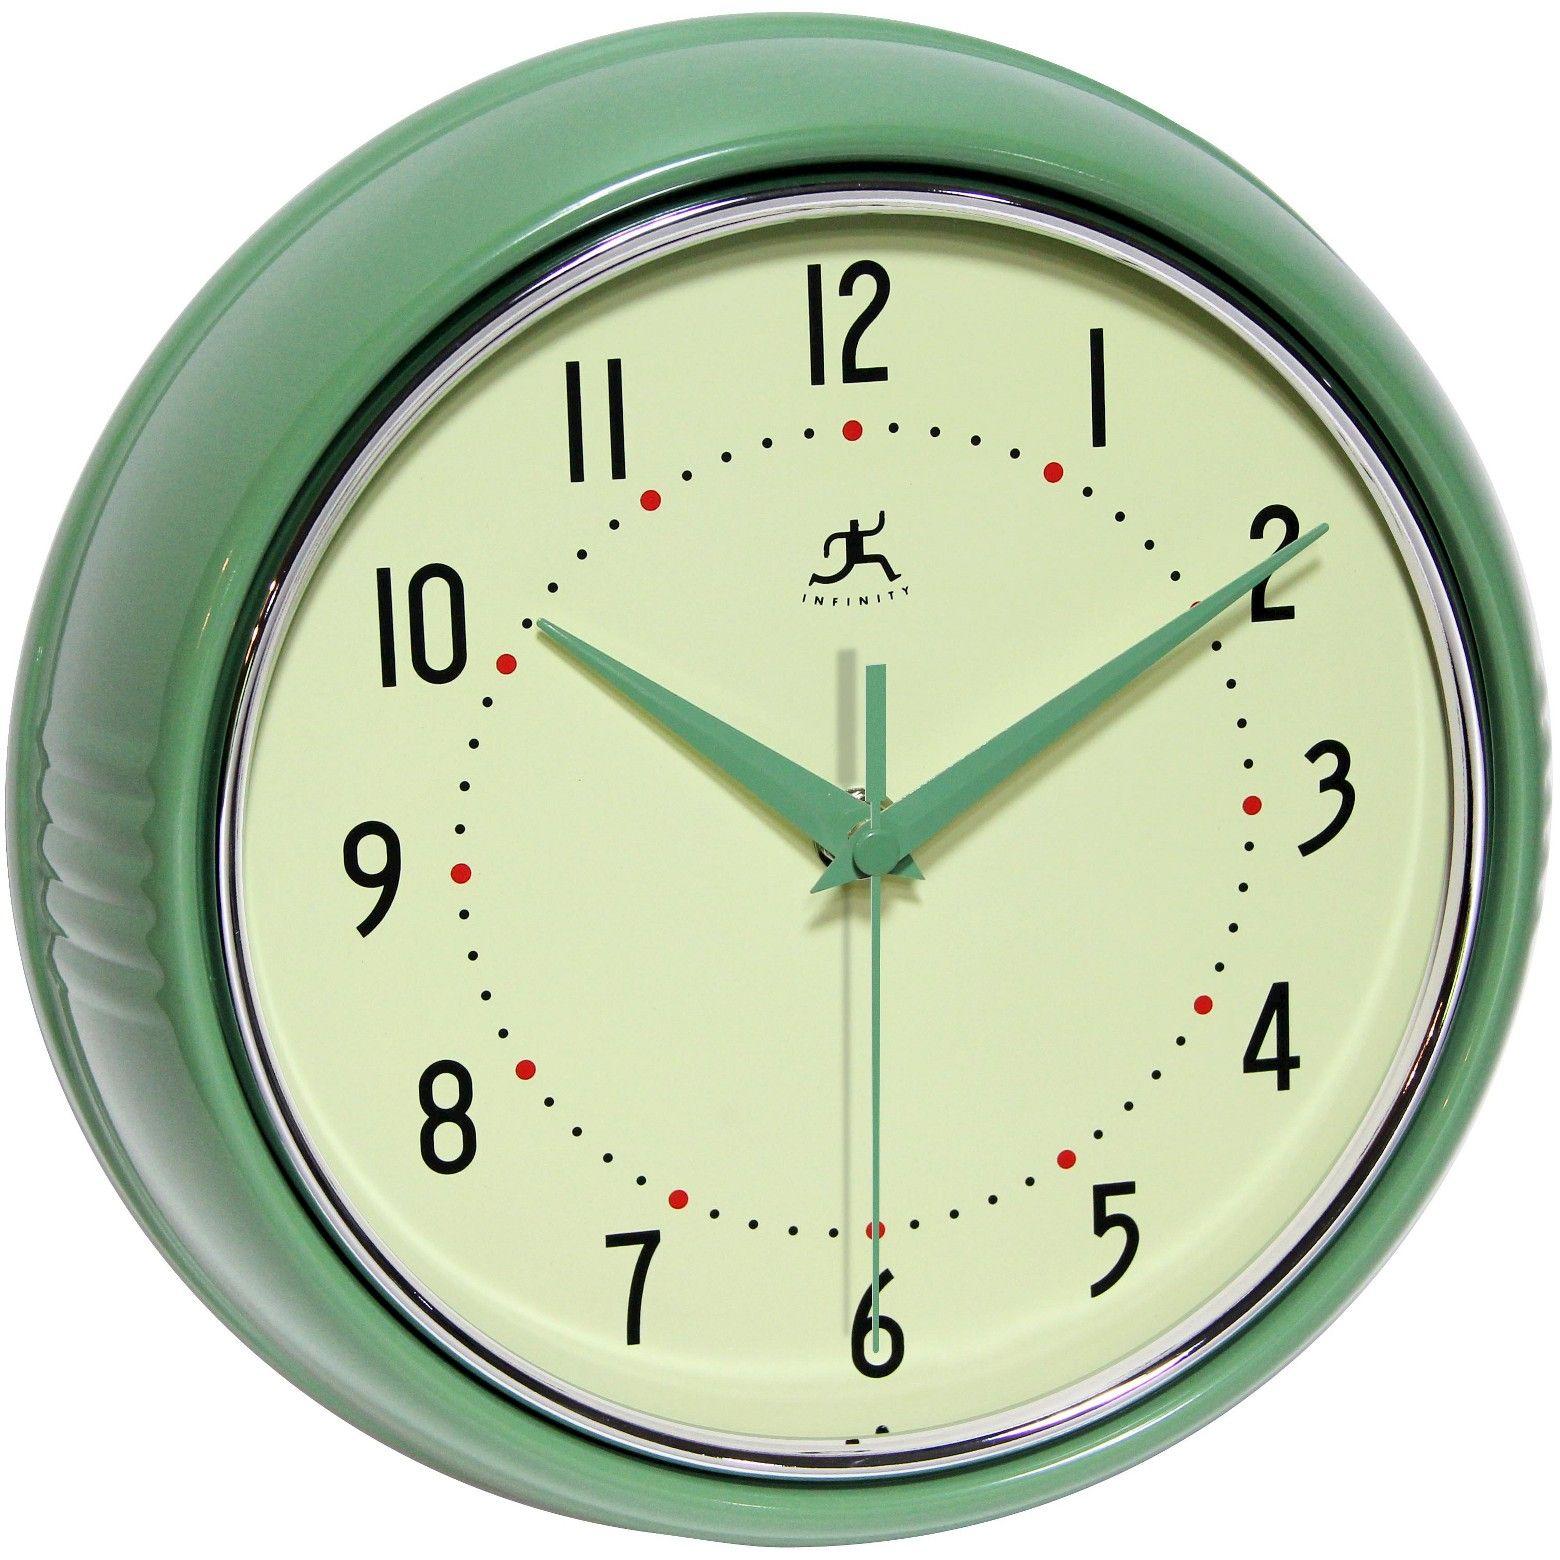 Retro Metal Wall Clock Green - Infinity Instruments | Wall clocks ...